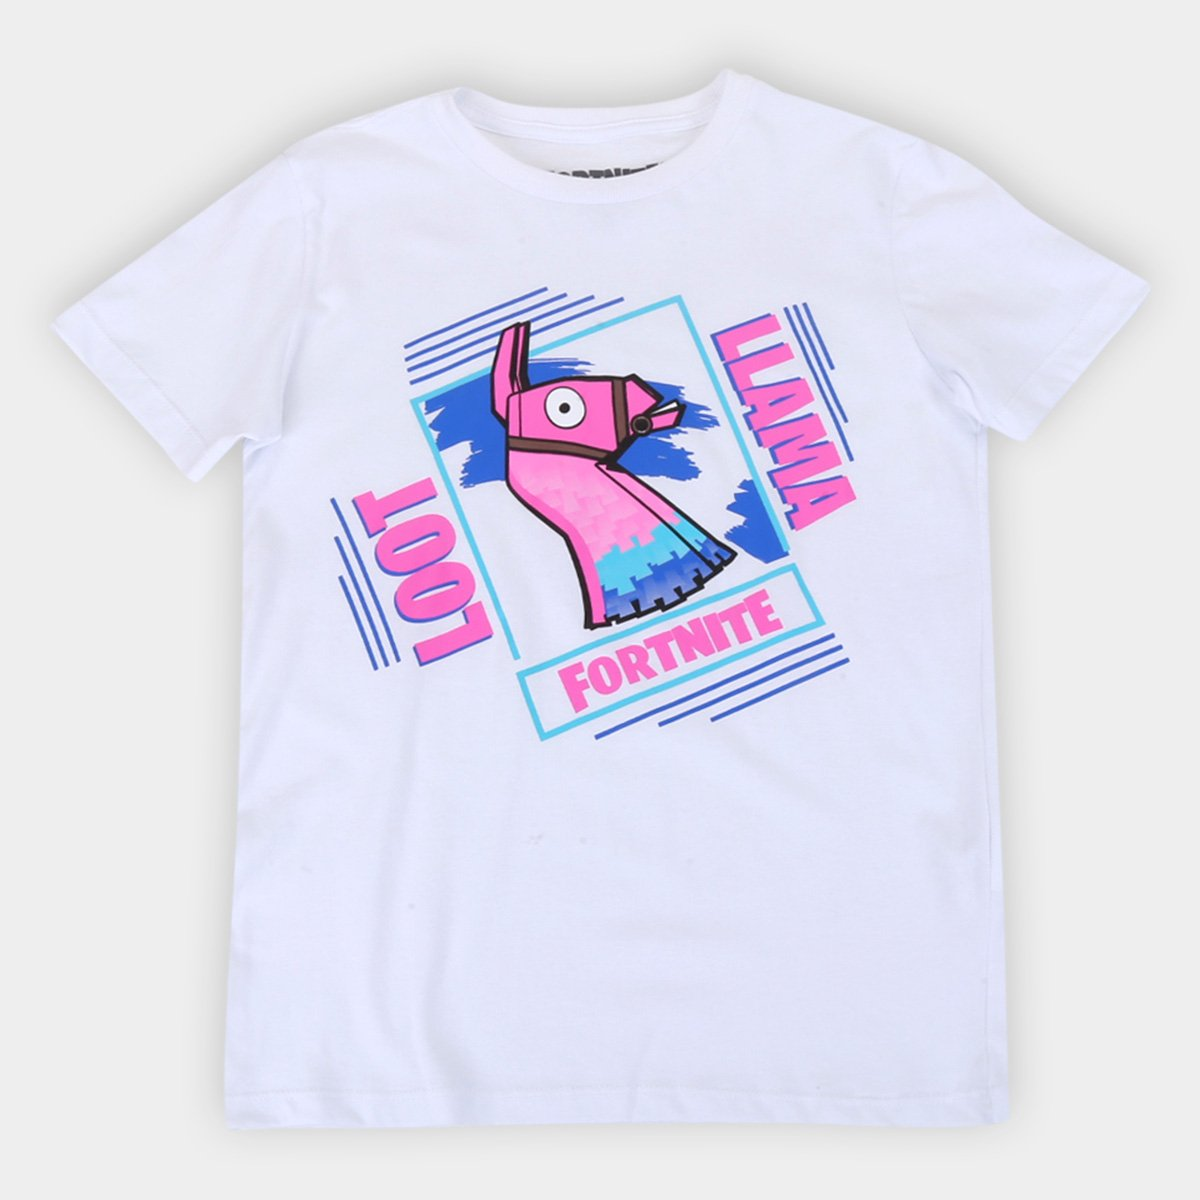 Camiseta Juvenil Fortnite Loot Lhama Masculina